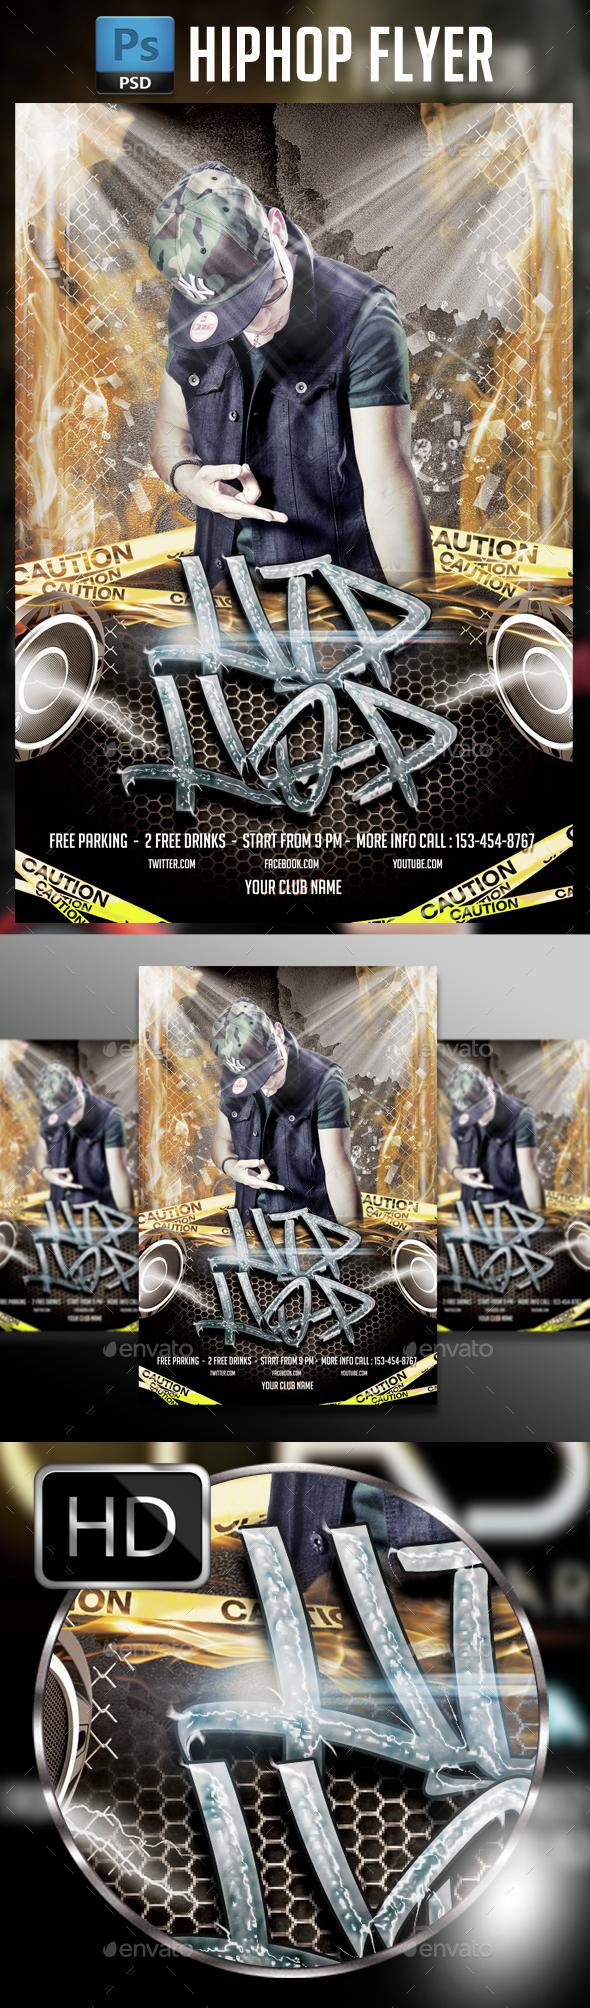 Hip Hop Flyer Template - Events Flyers